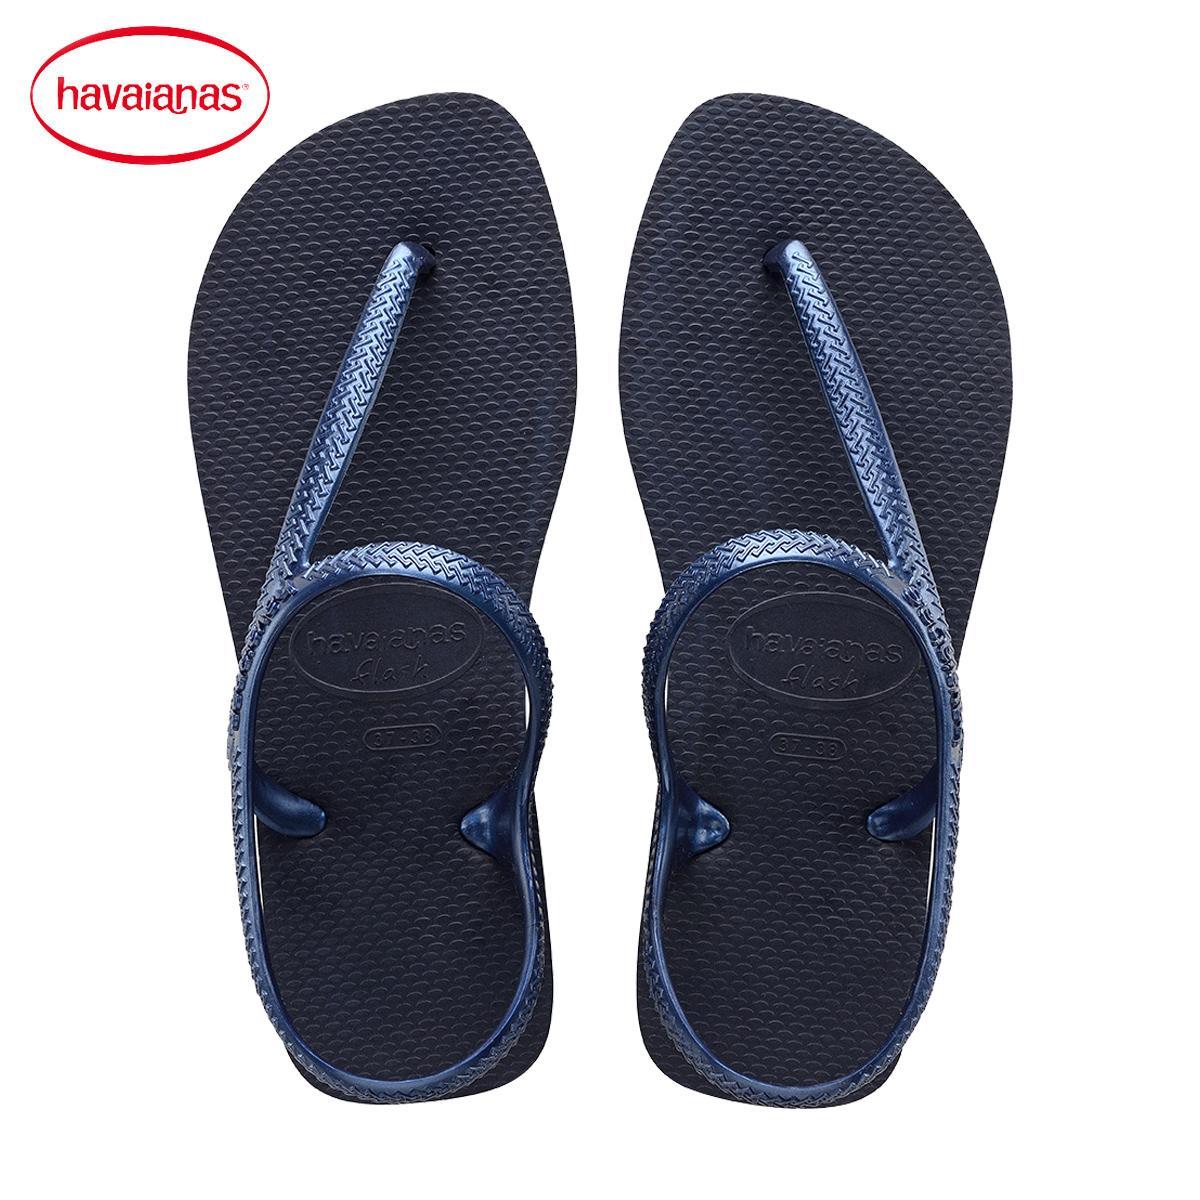 Havaianas Sepatu Anak Sandal Summer Angkatan Laut Biru